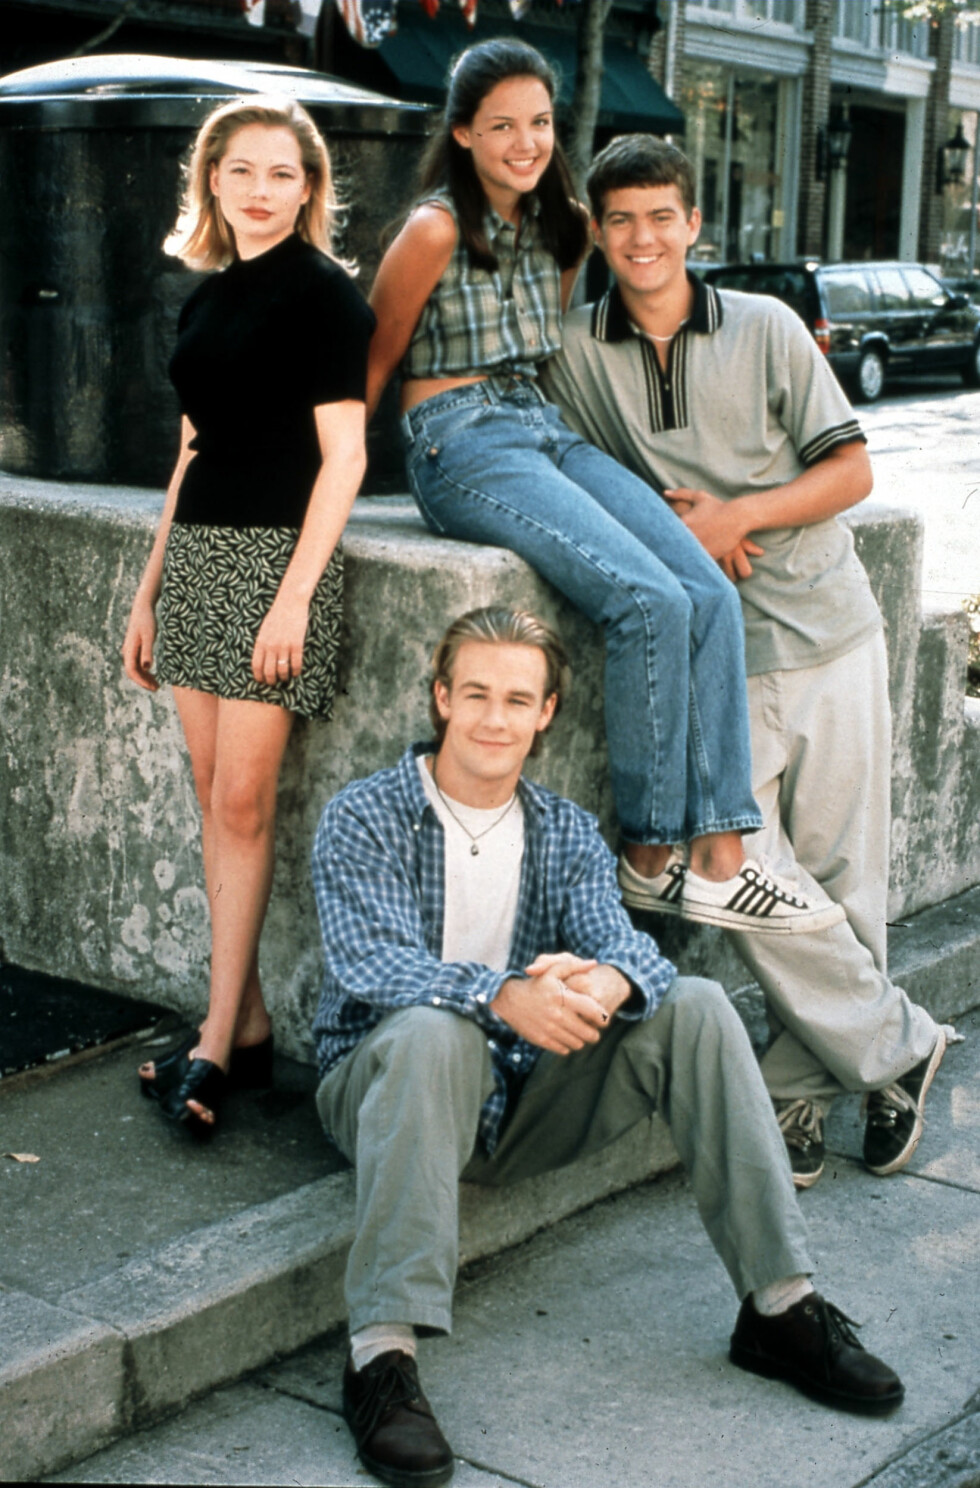 90-TALLS STJERNE: Joshua Jackson slo igjennom i 90-talls serien «Dawson's Creek». Foto: Mary Evans Picture